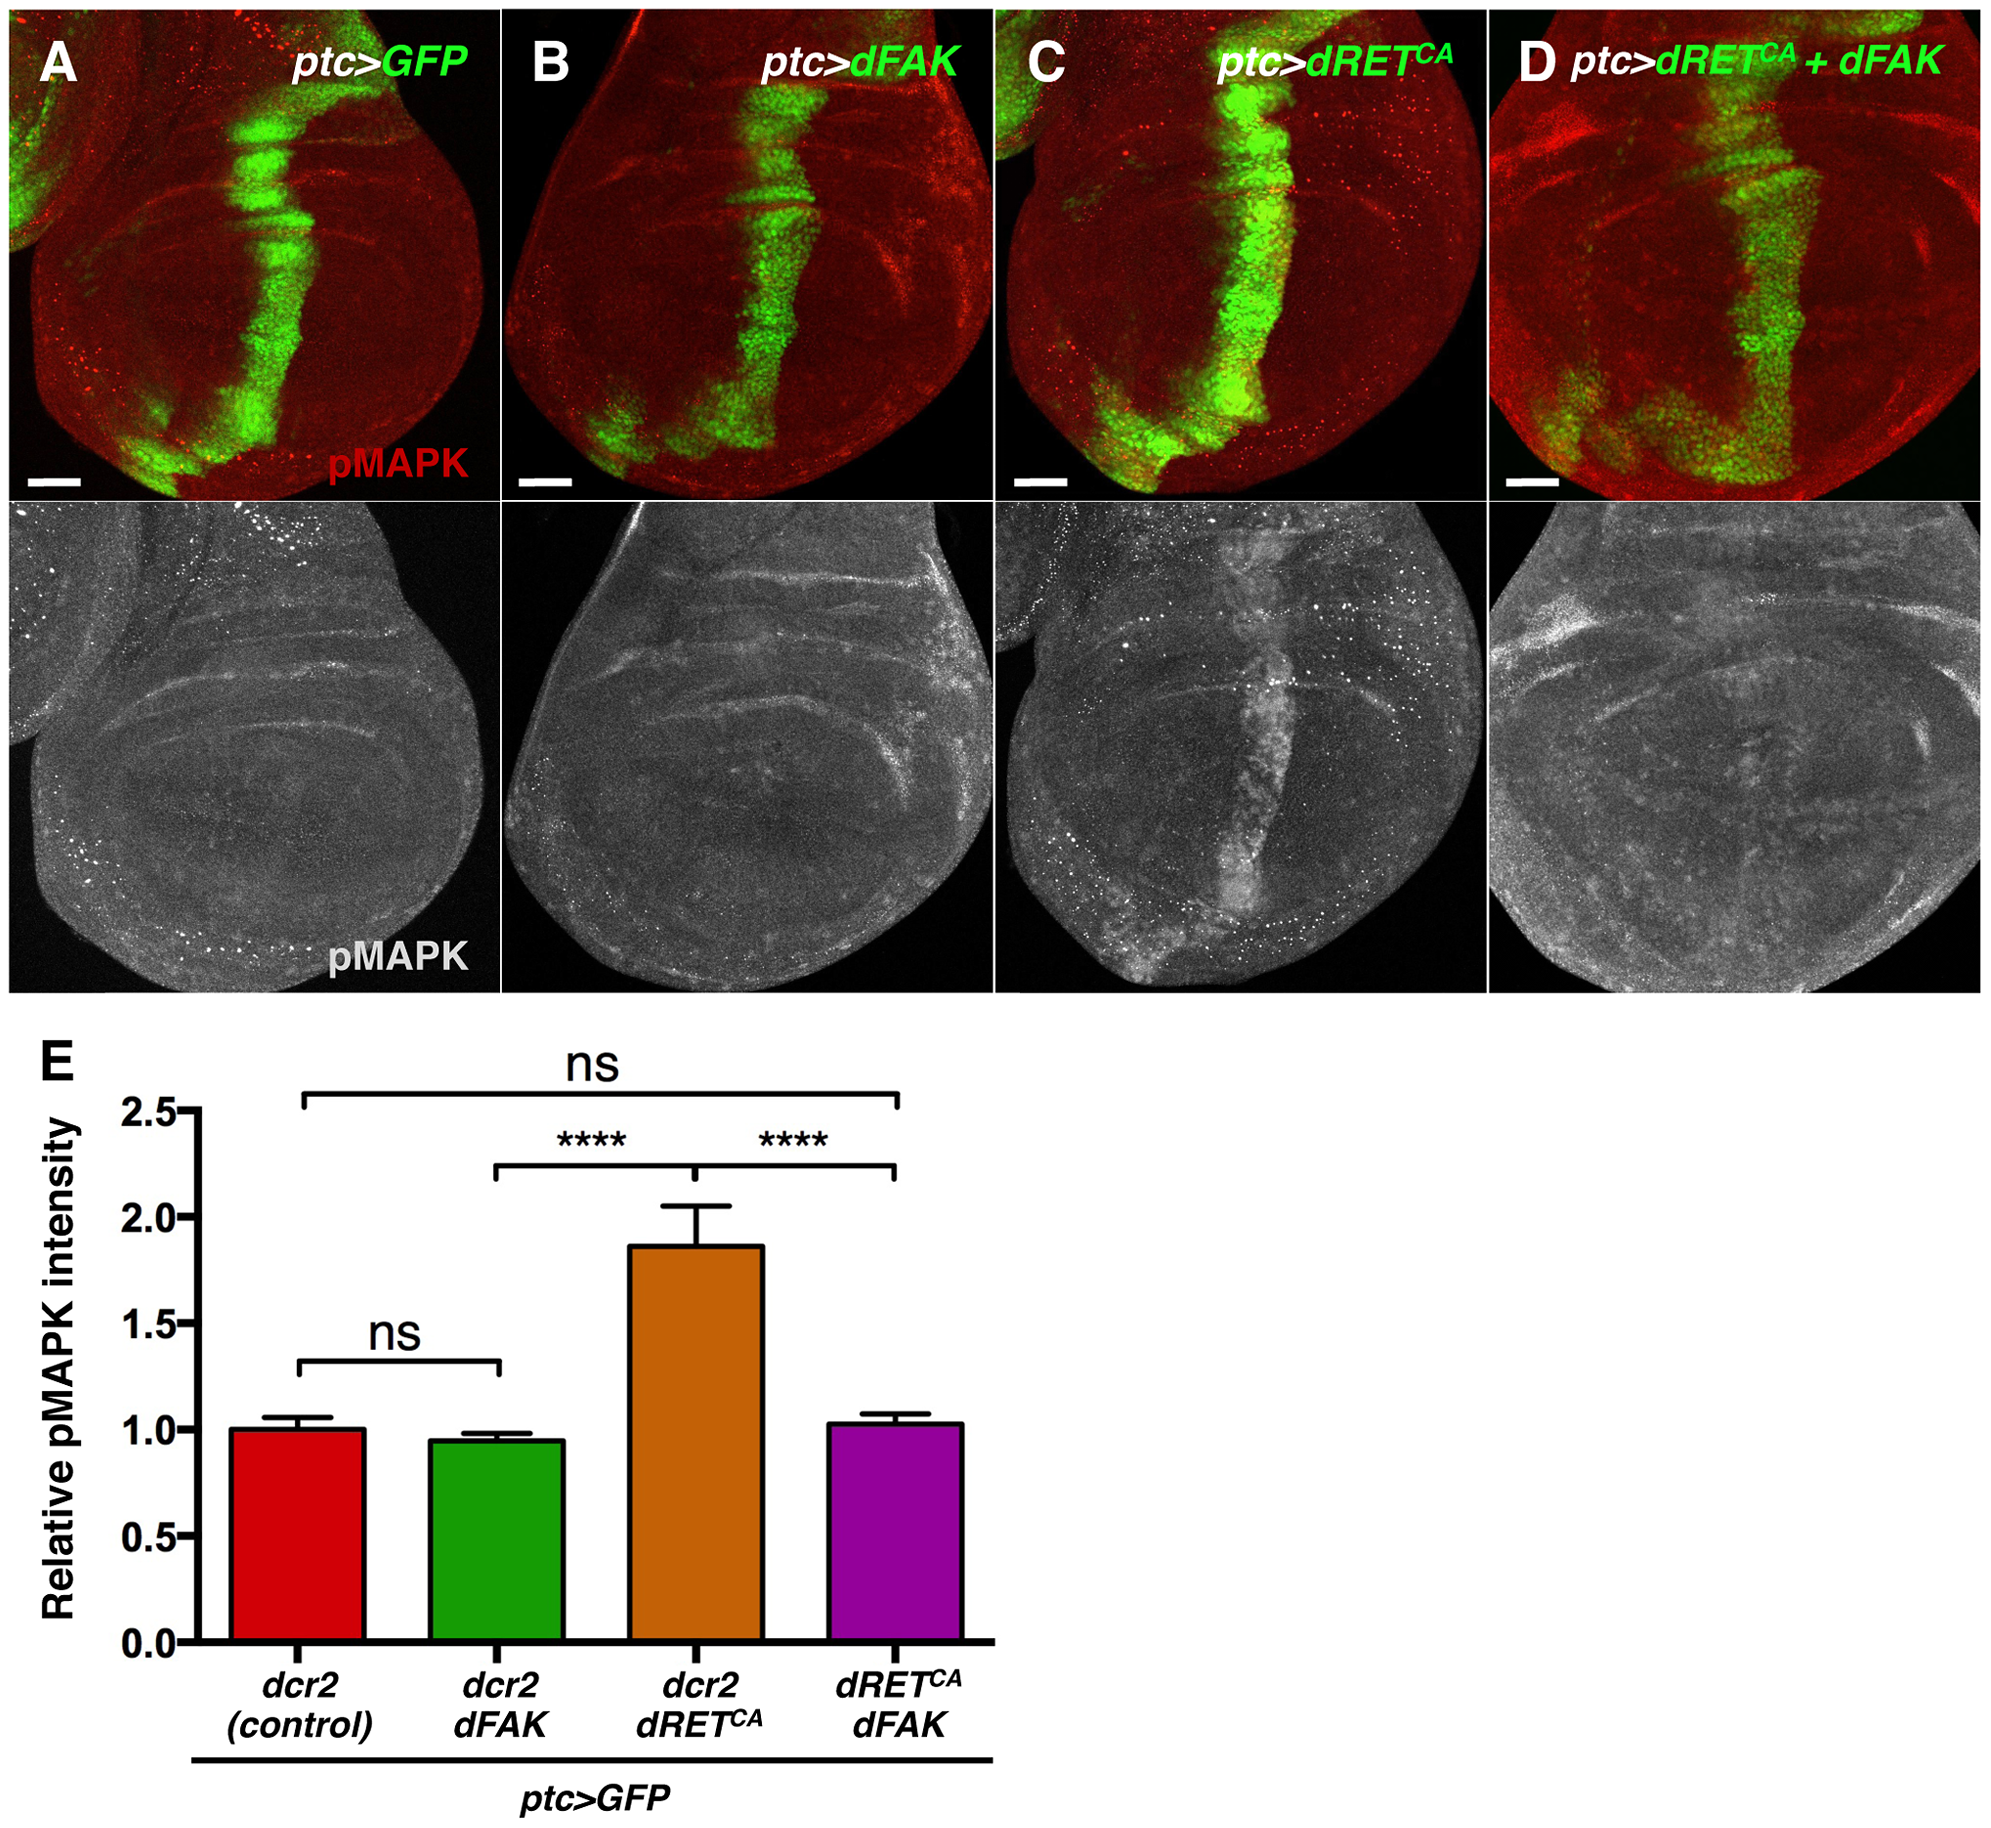 FAK inhibits RTK signalling by impairing Ras/MAPK pathway.